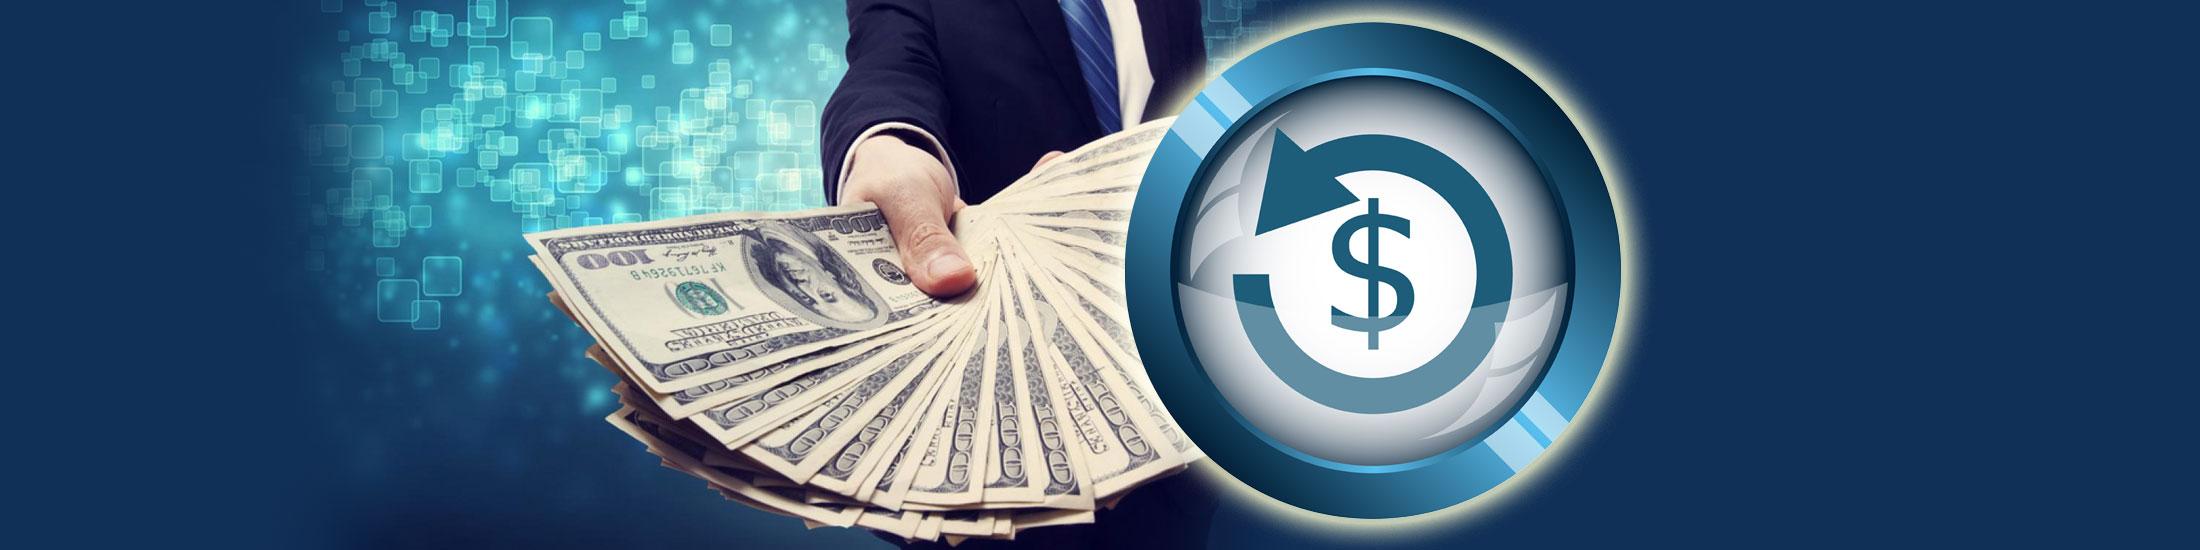 Chargeback Lands $6.6 Million Investment